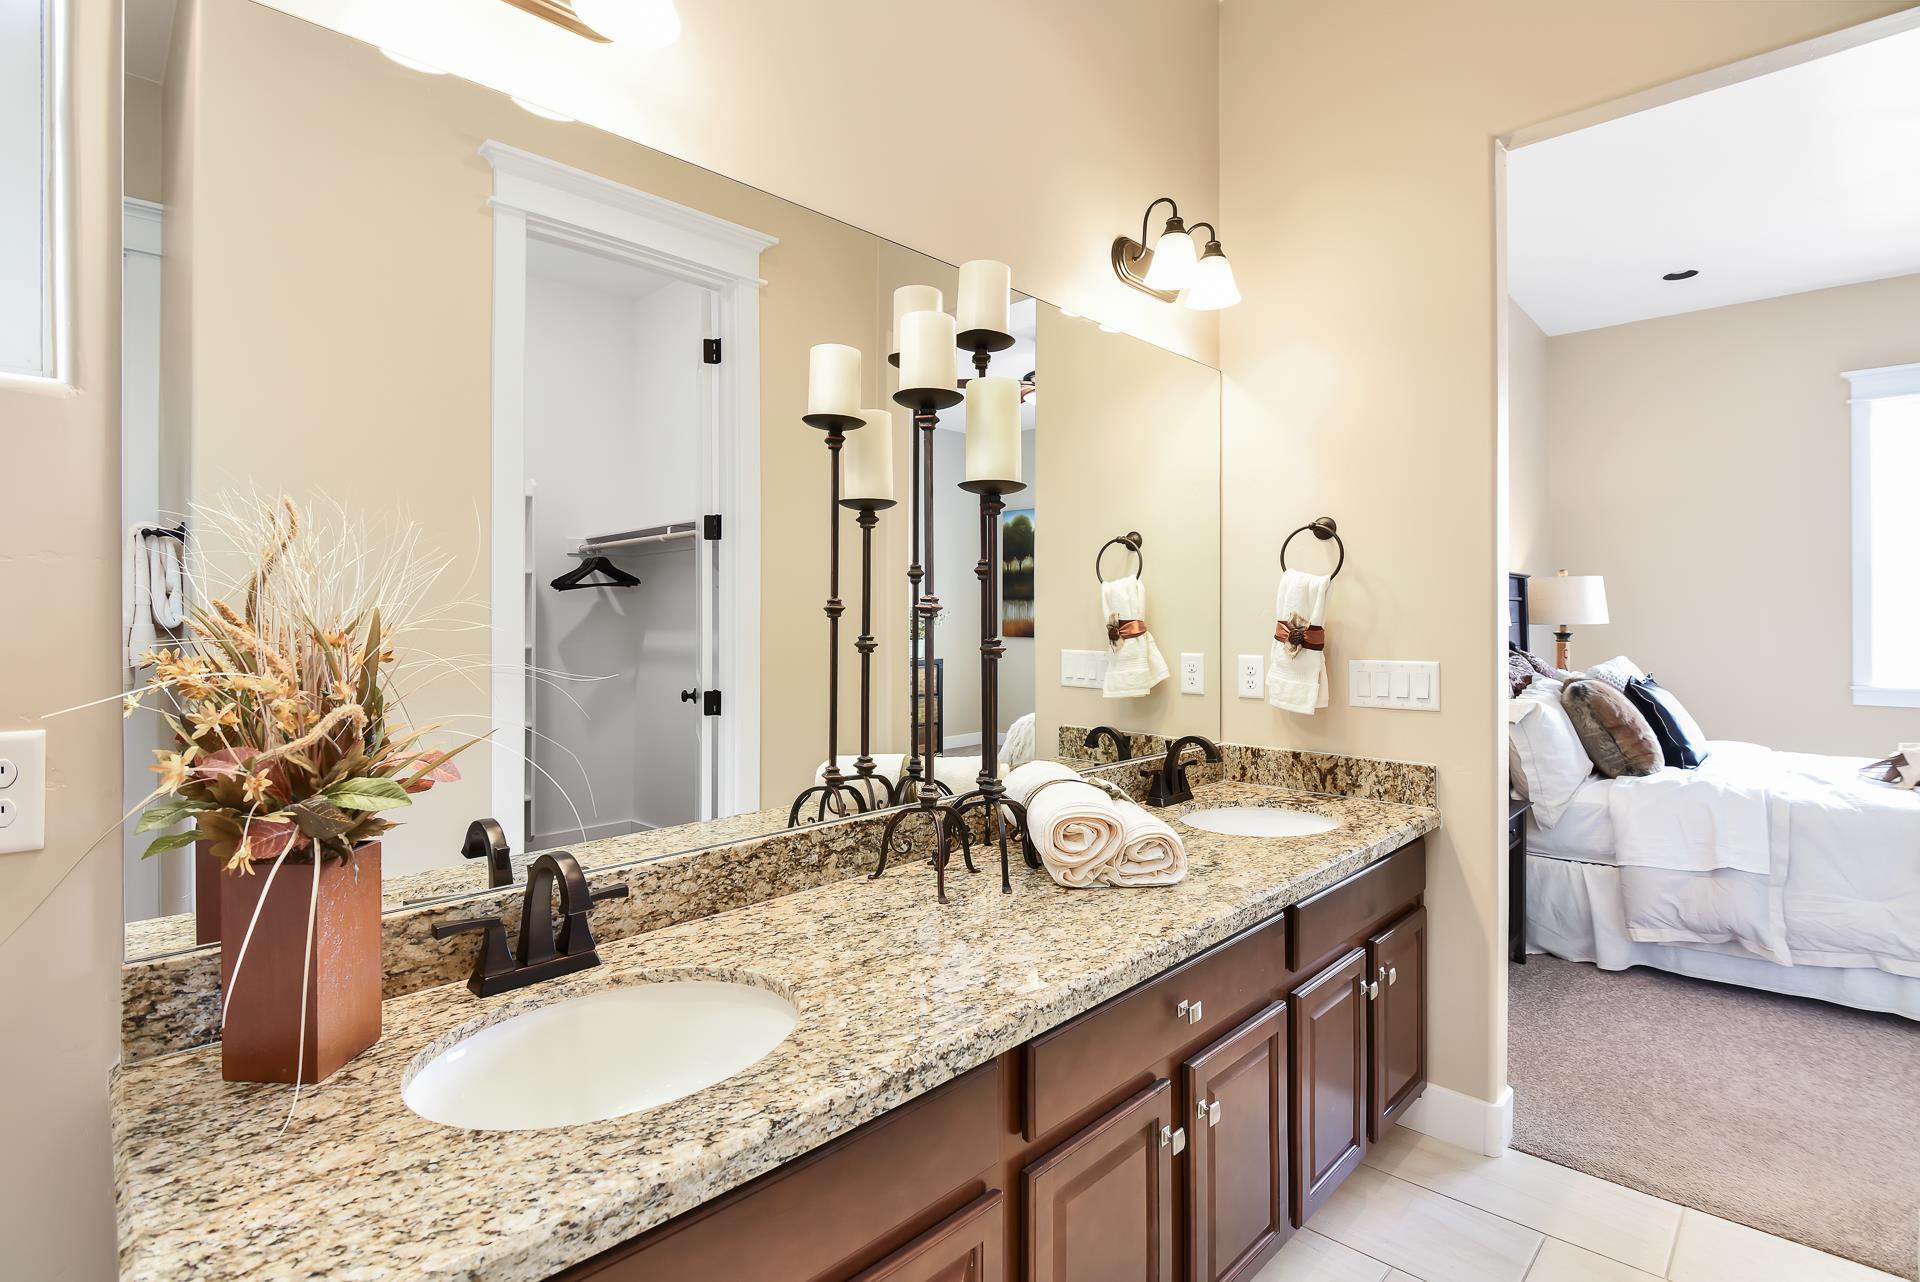 Bathroom featured in the Flagstaff Meadows Plan 1896 By Capstone Homes in Flagstaff, AZ